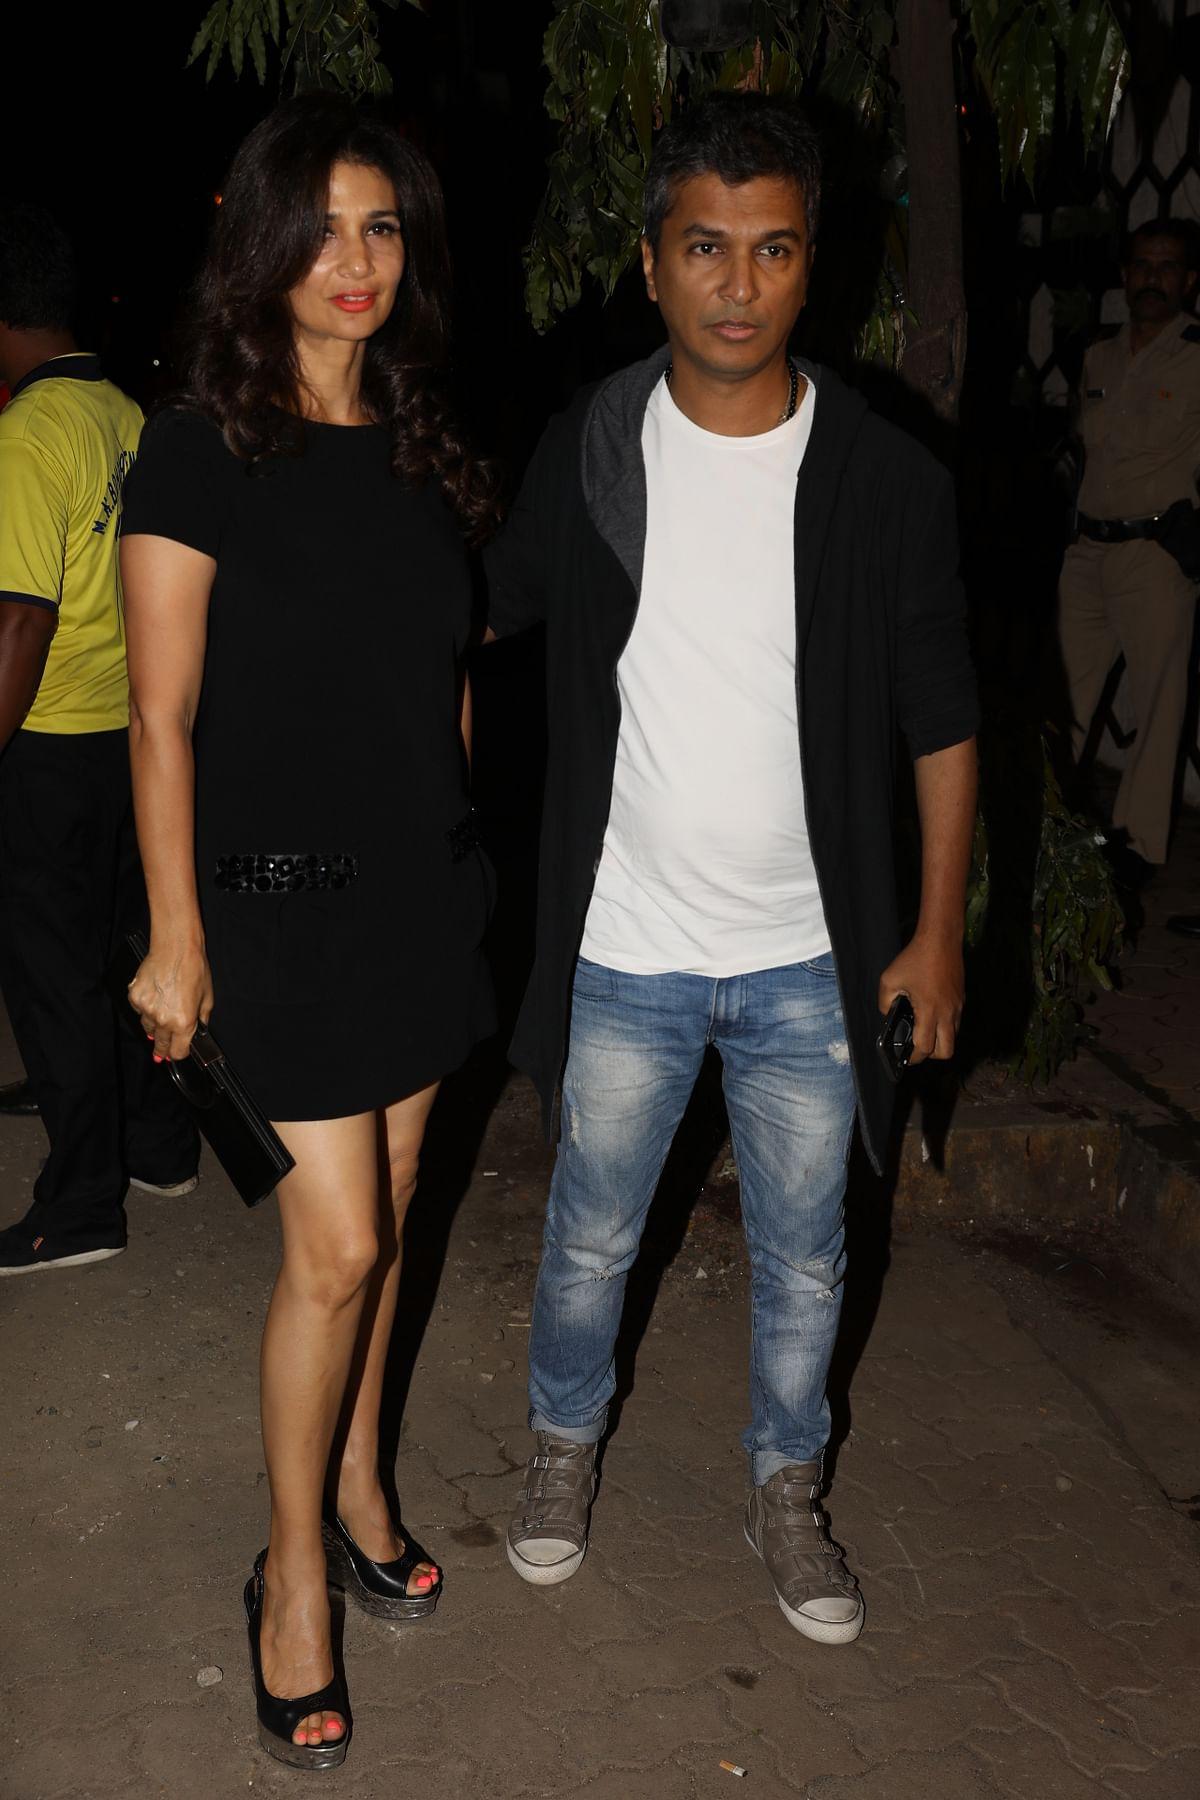 Model Rhea Pillai was seen with designer Vikram Phadnis. (Photo: Yogen Shah)